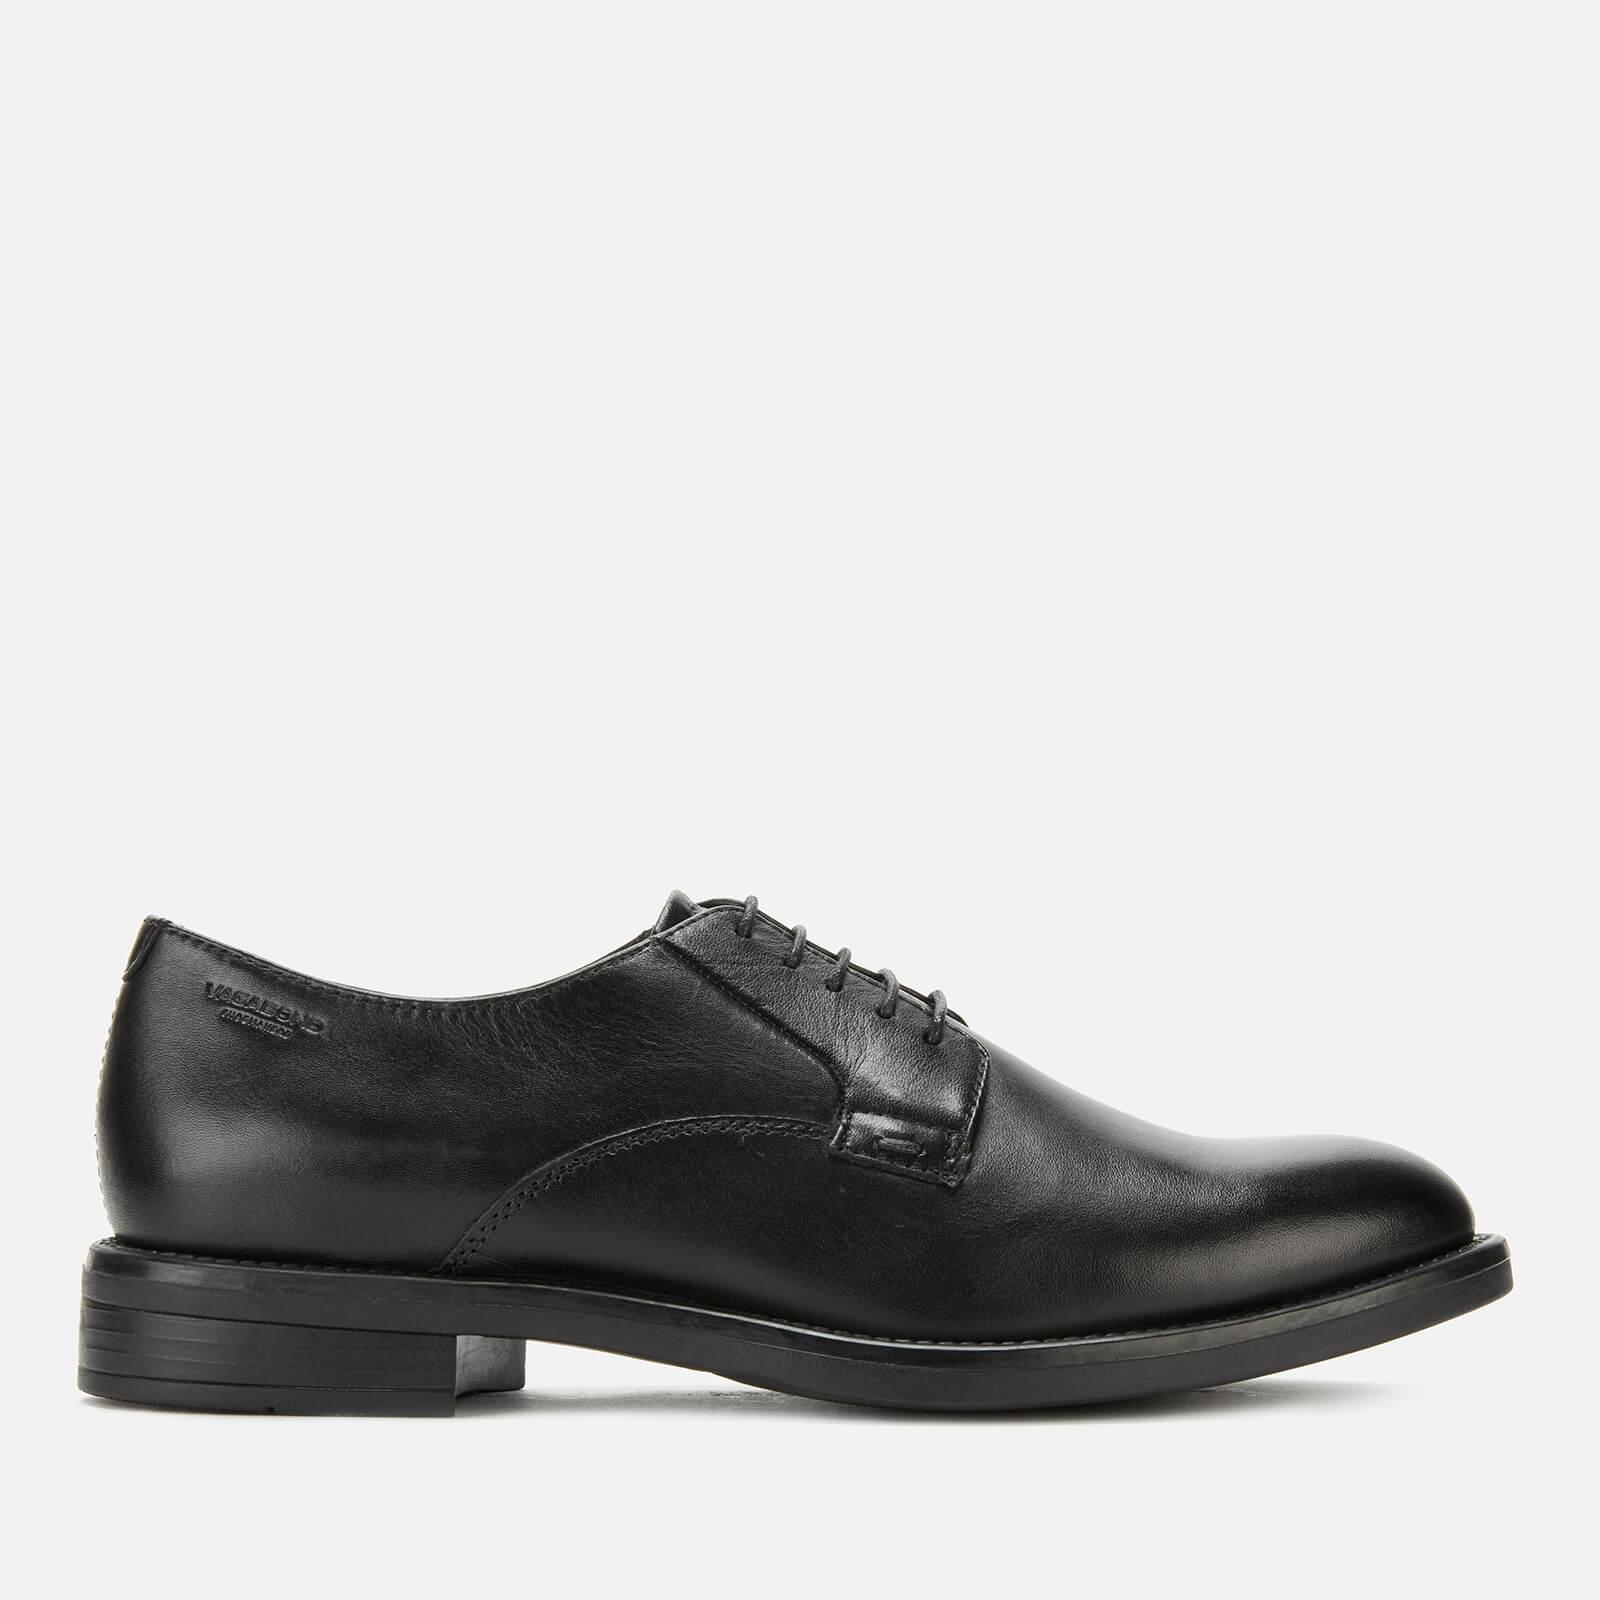 Vagabond Women's Amina Leather Derby Shoes - Black - UK 6 - Black